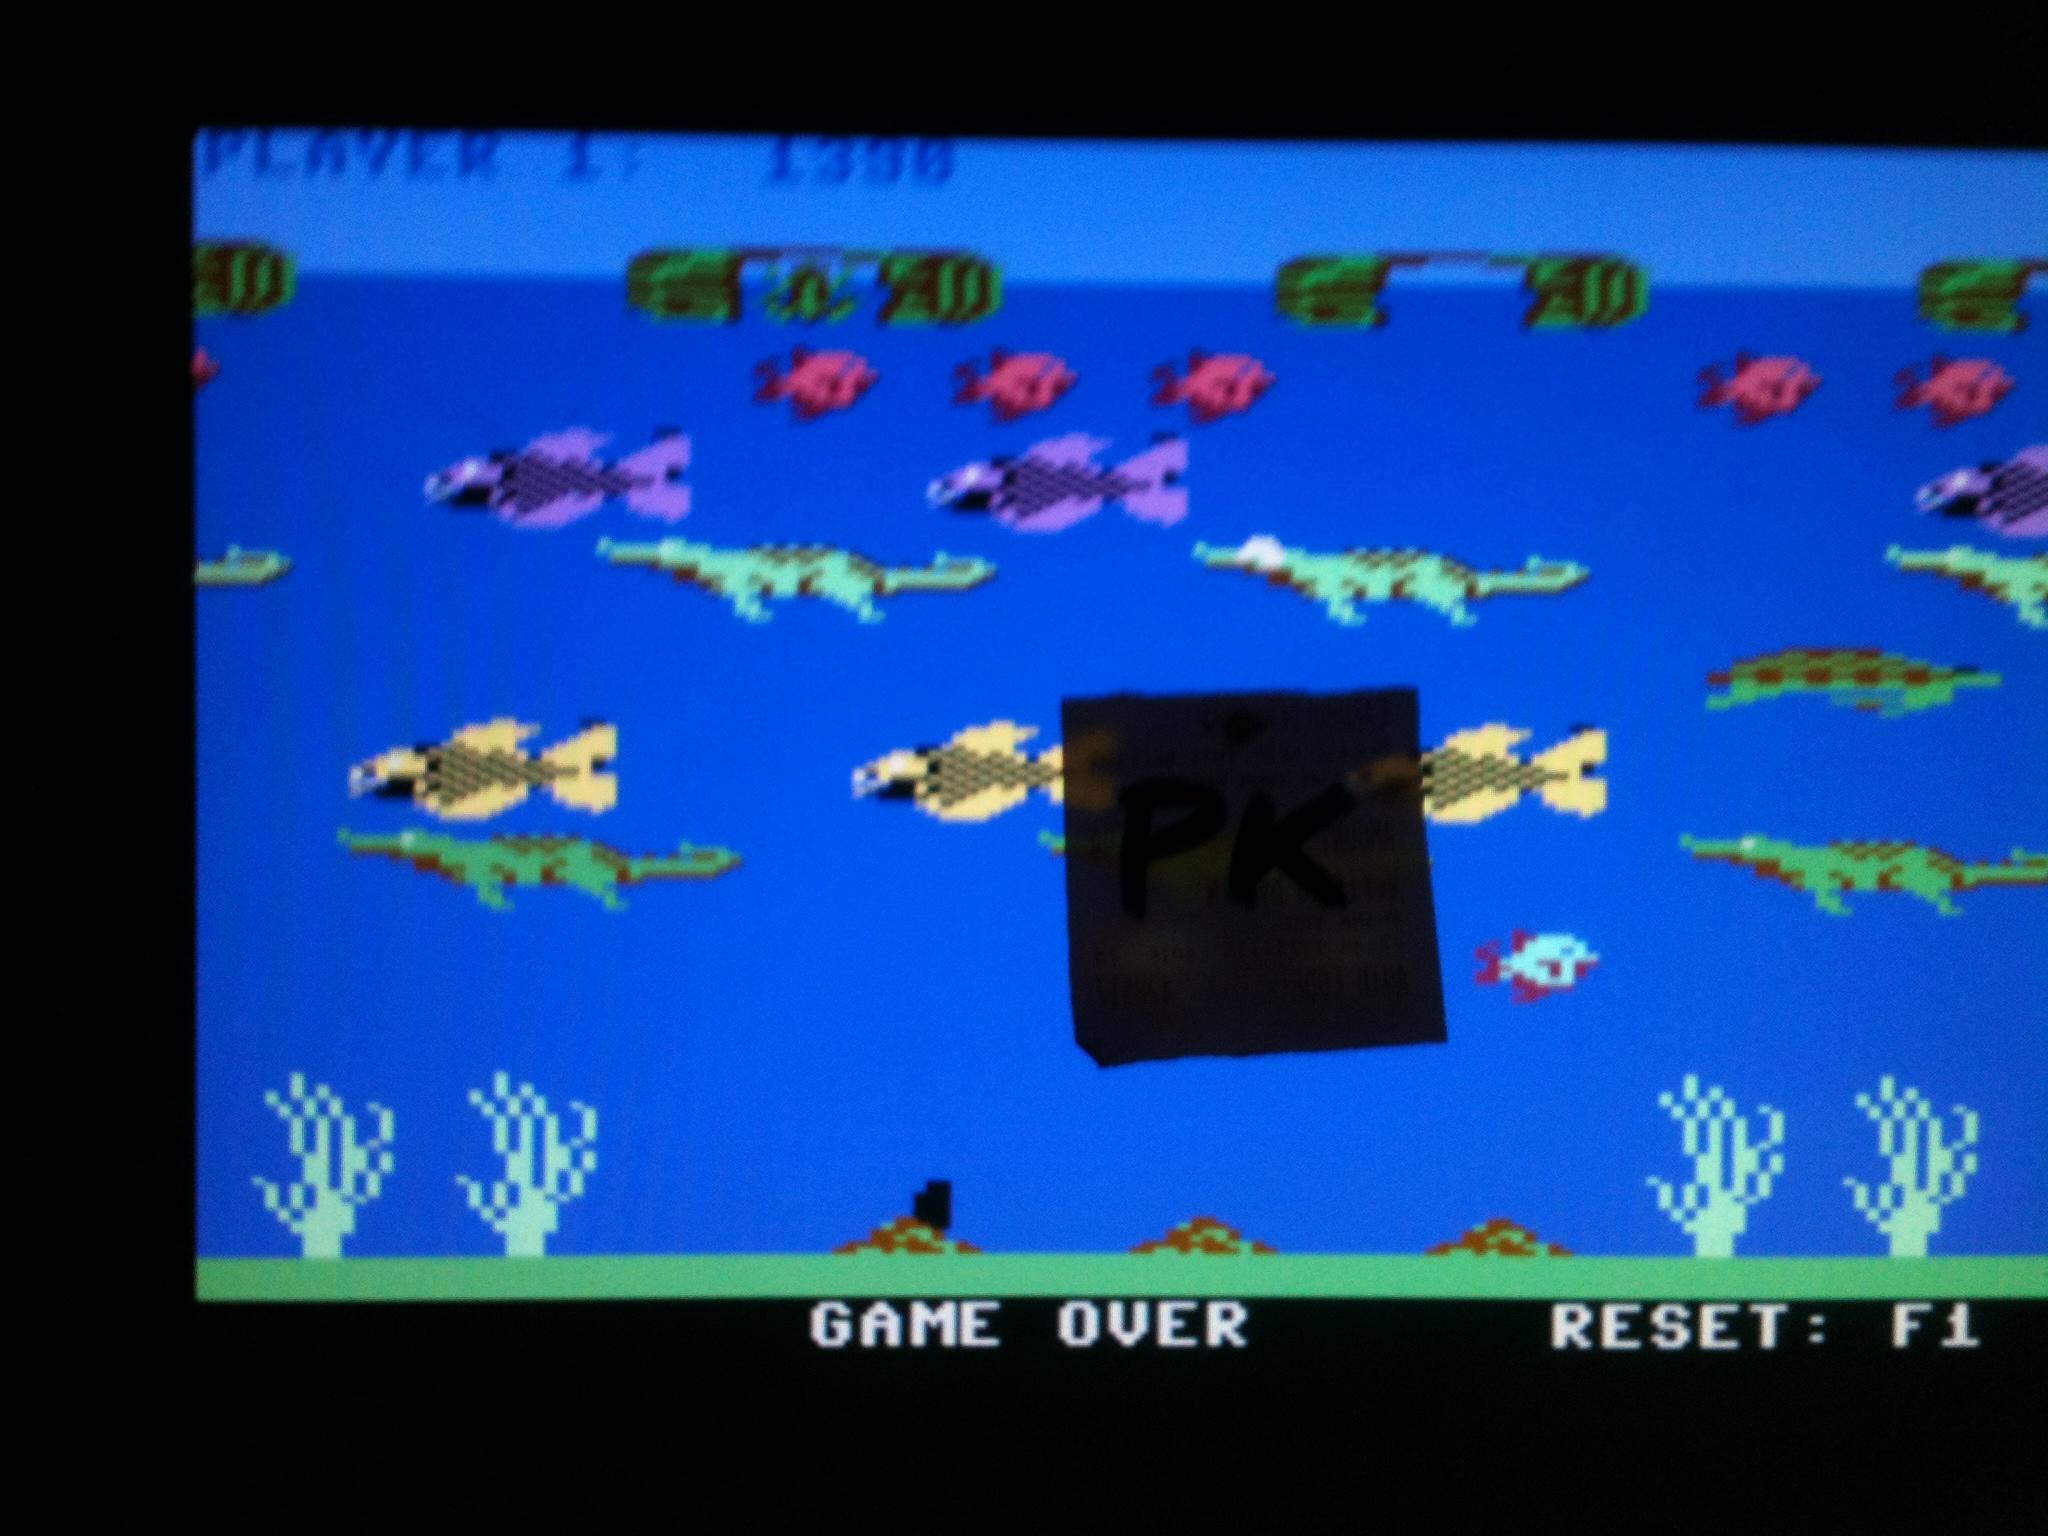 kernzy: Frogger II - Threedeep: Hard (Commodore 64 Emulated) 1,330 points on 2015-12-19 14:02:23